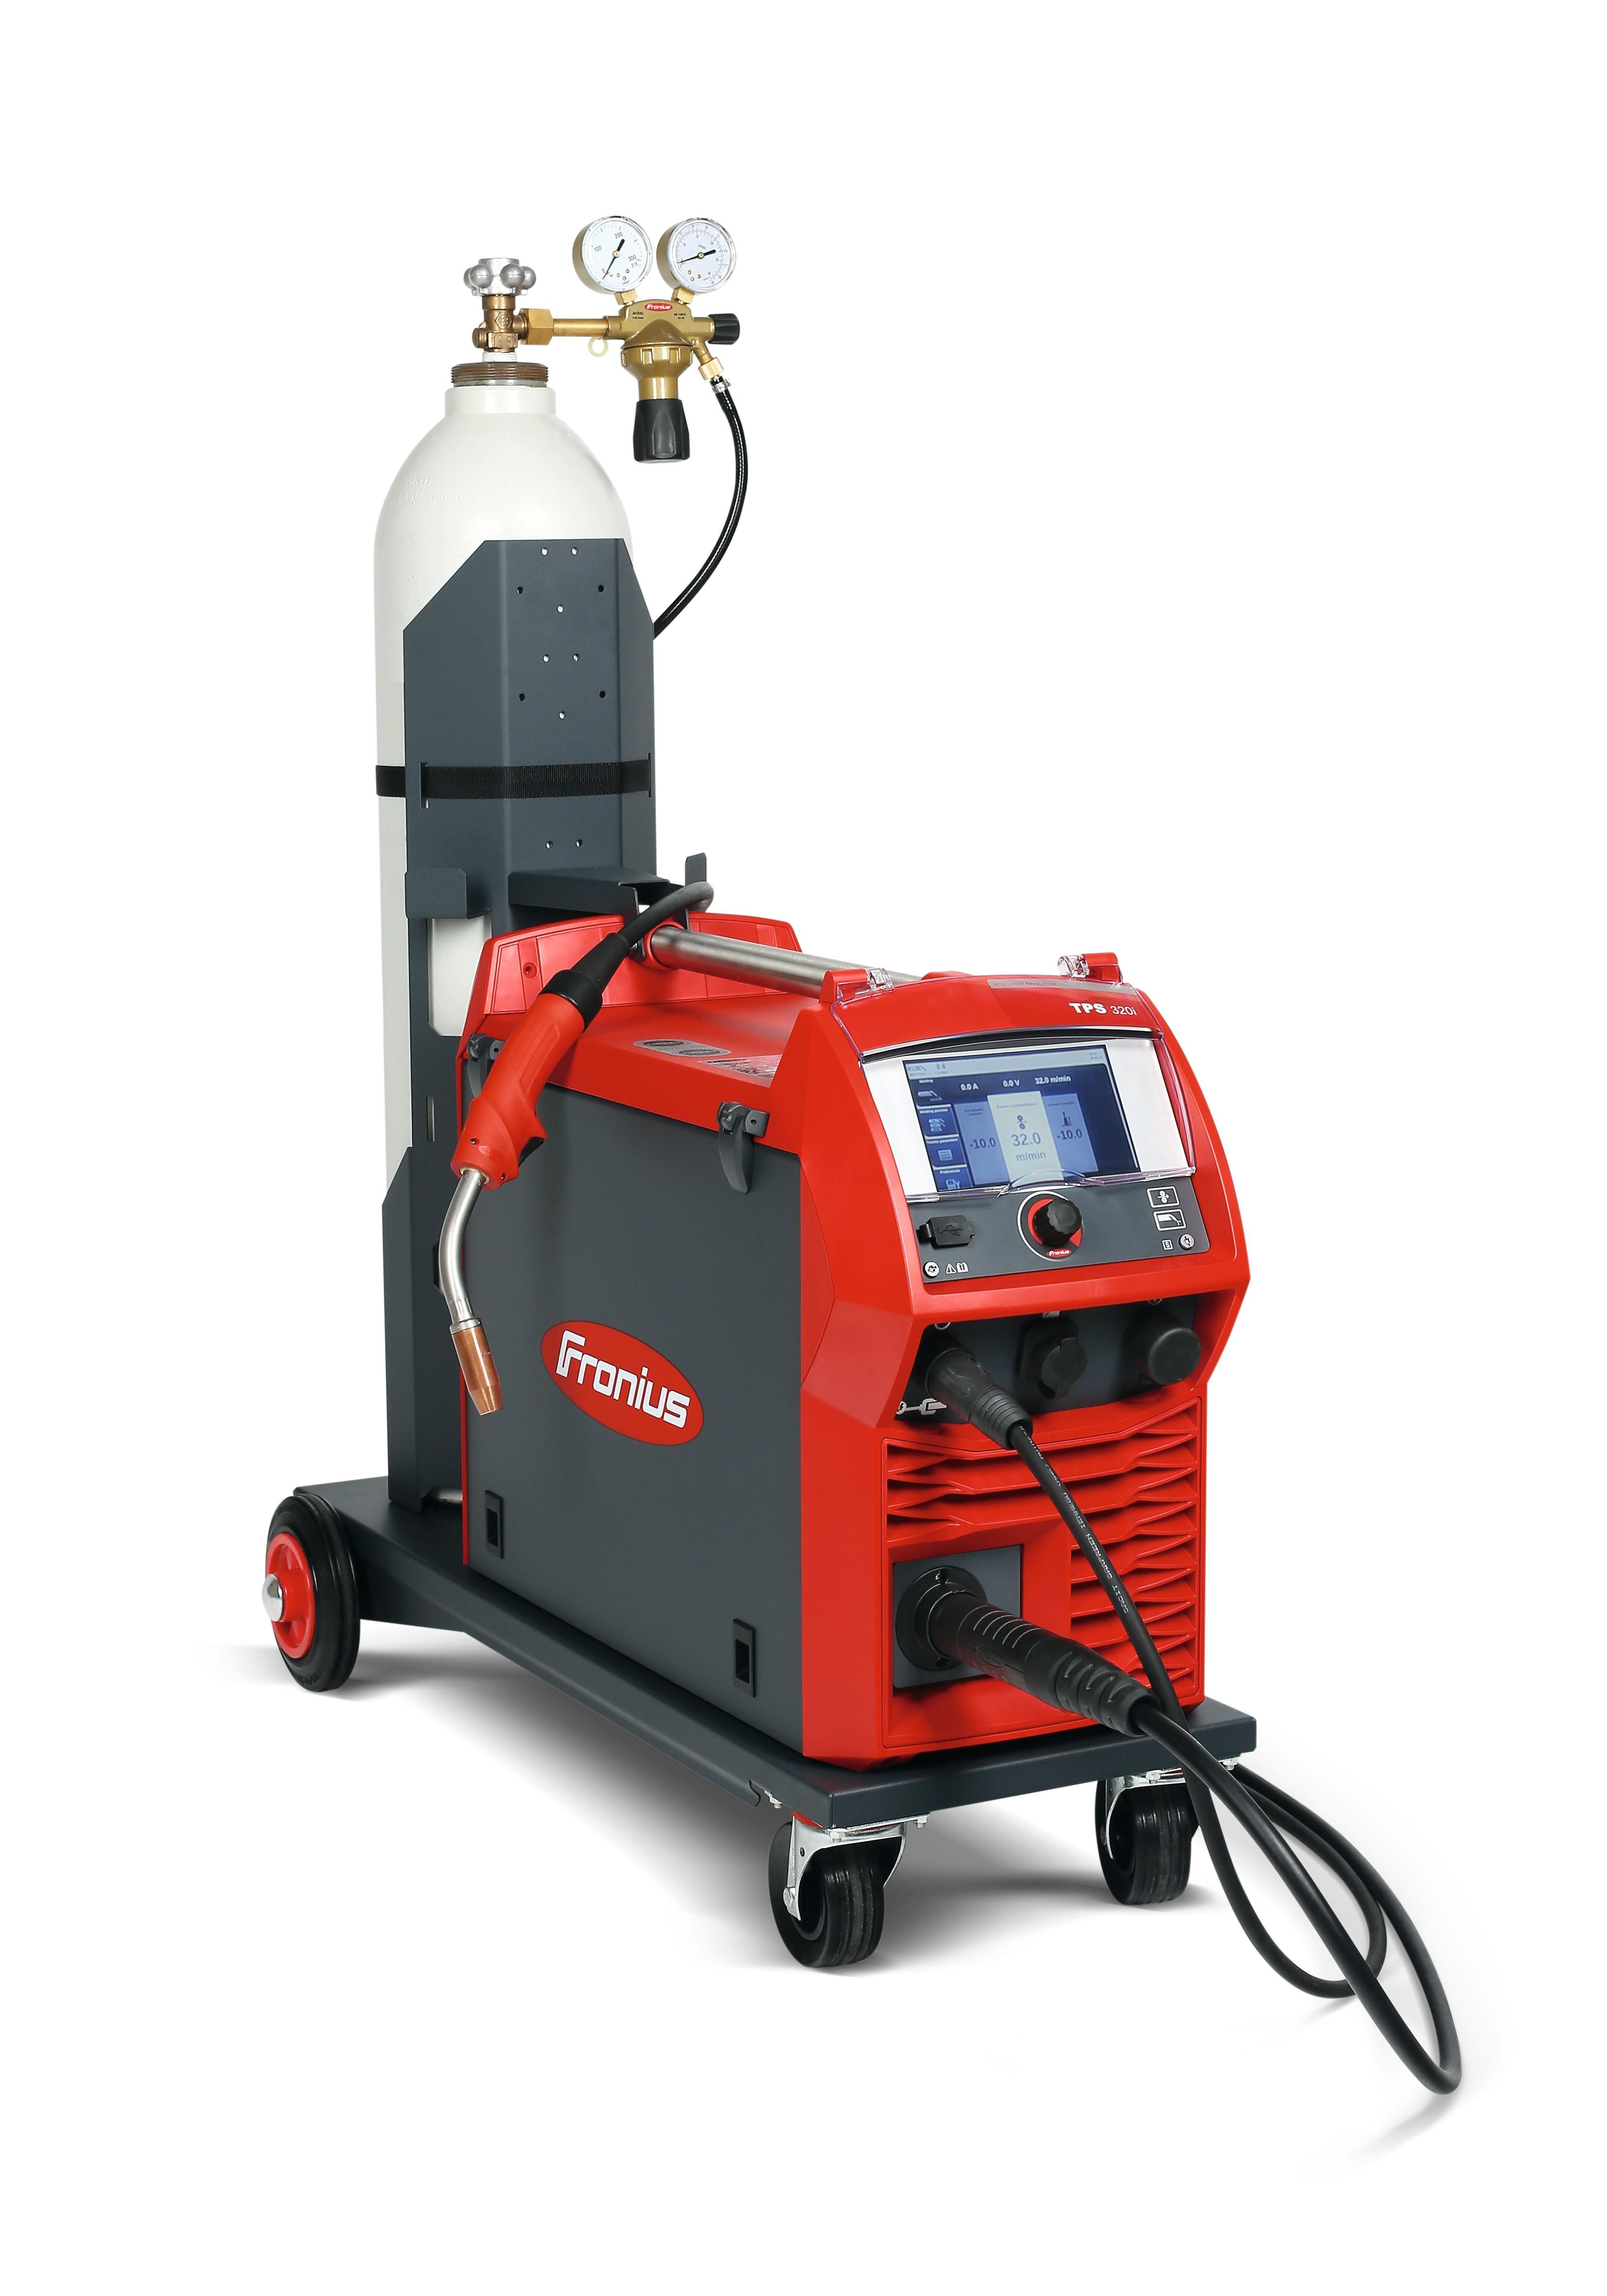 Fronius Tps 320i C Pulse Miganglia Welding Equipment